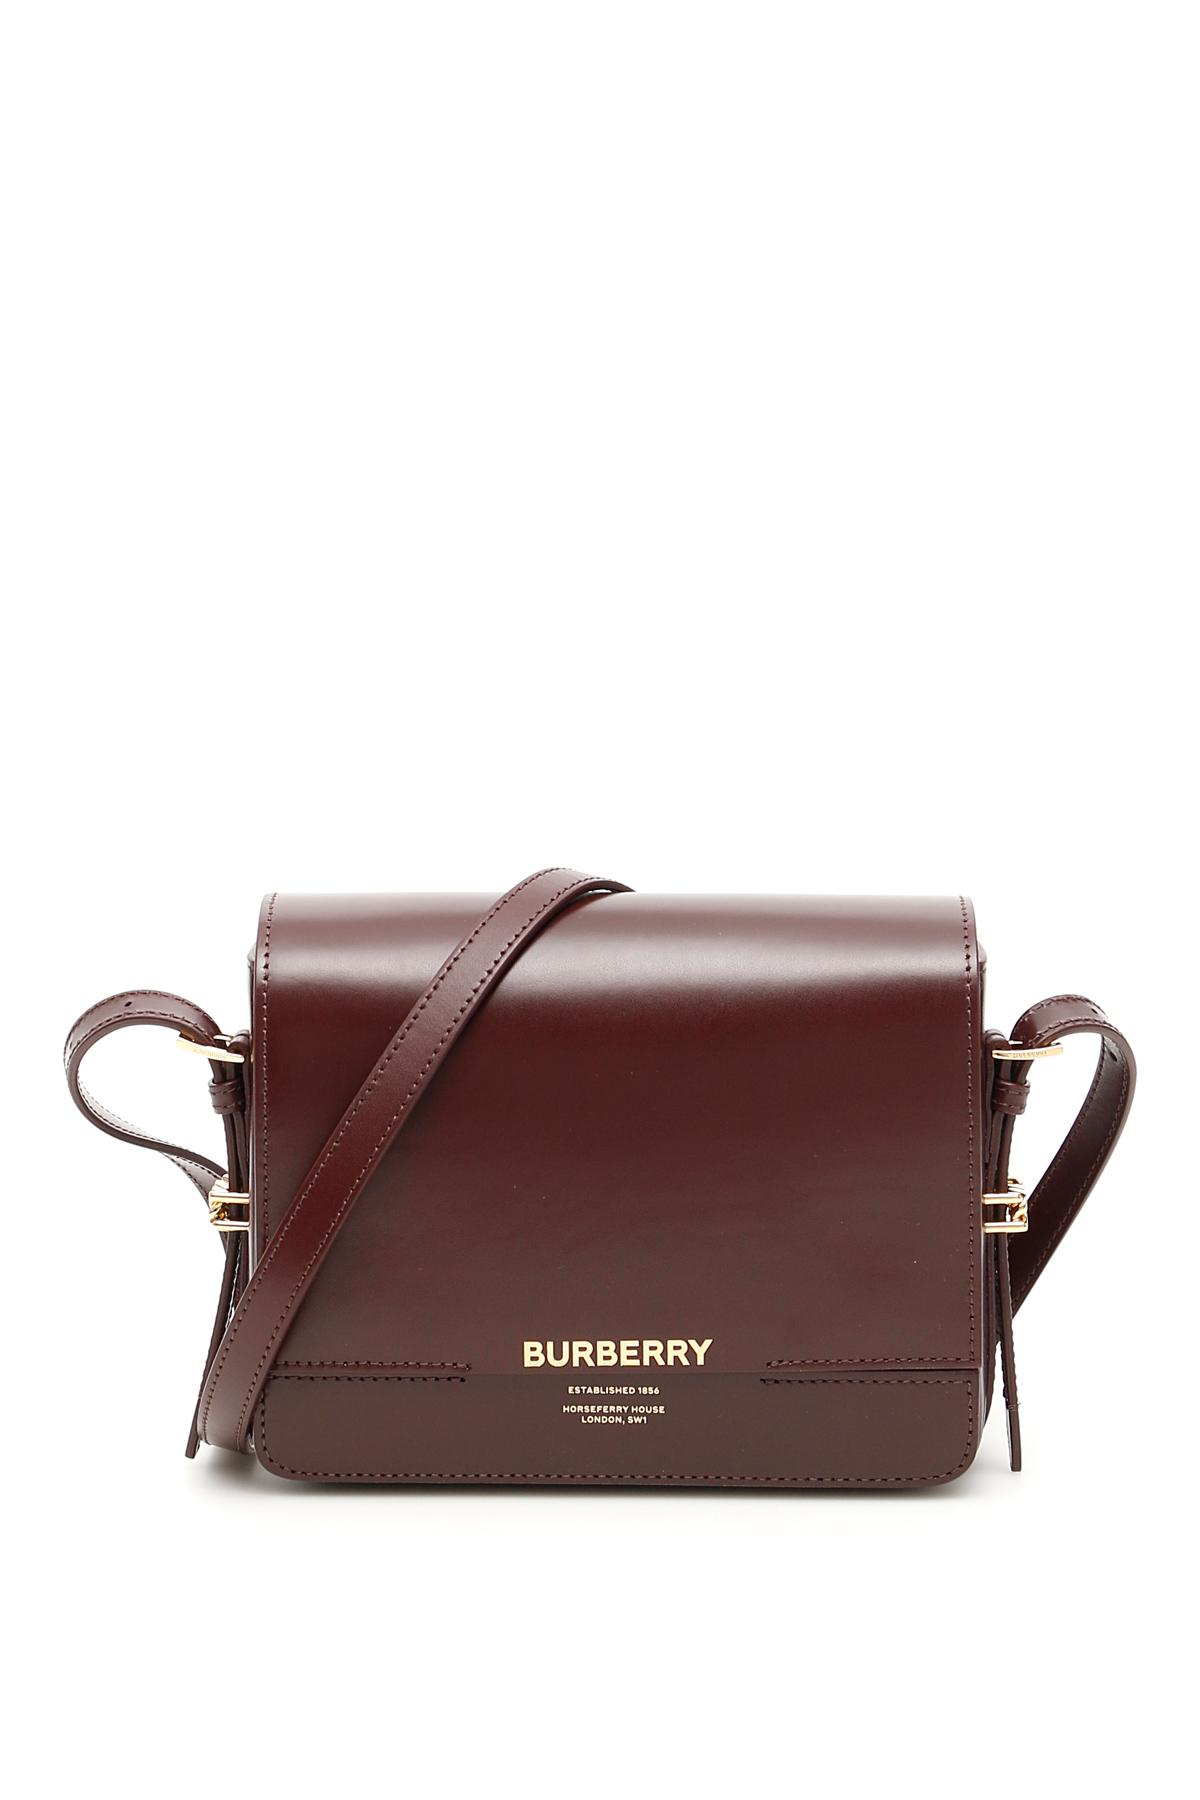 4b8ae54c86 Burberry Small Grace Bag - Lyst